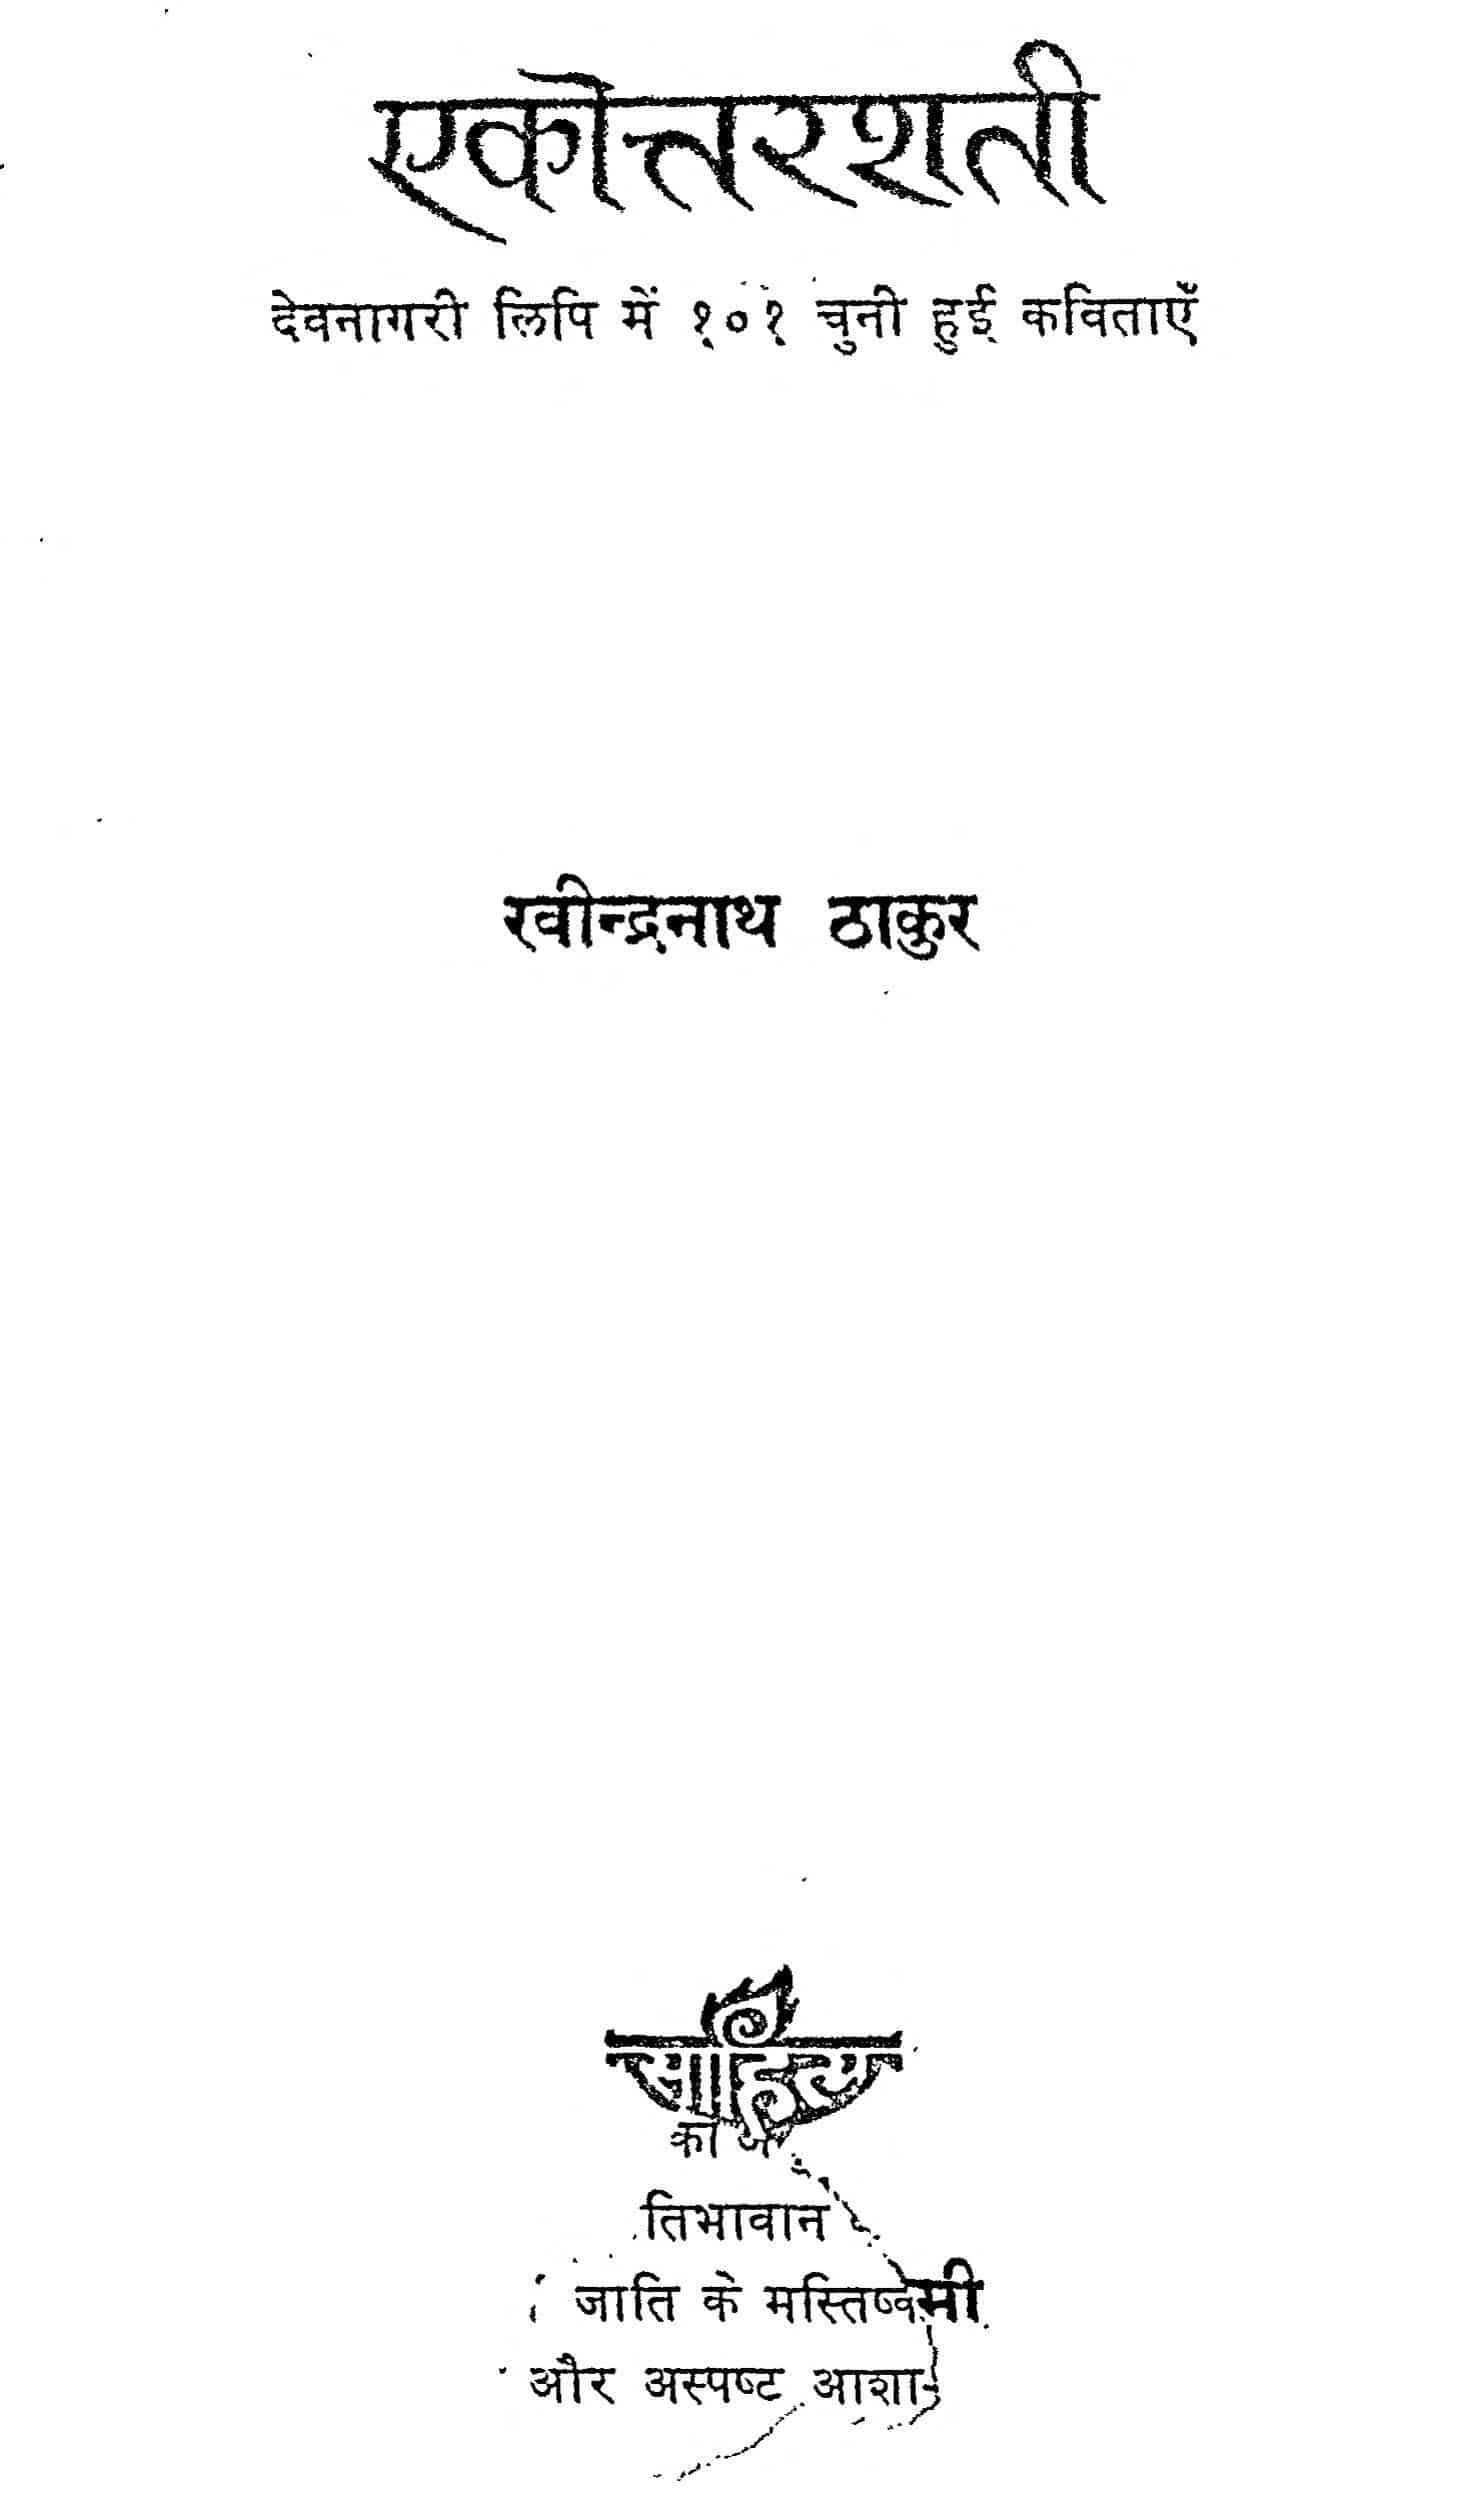 Akottarashati by रवीन्द्रनाथ ठाकुर - Ravindranath Thakur